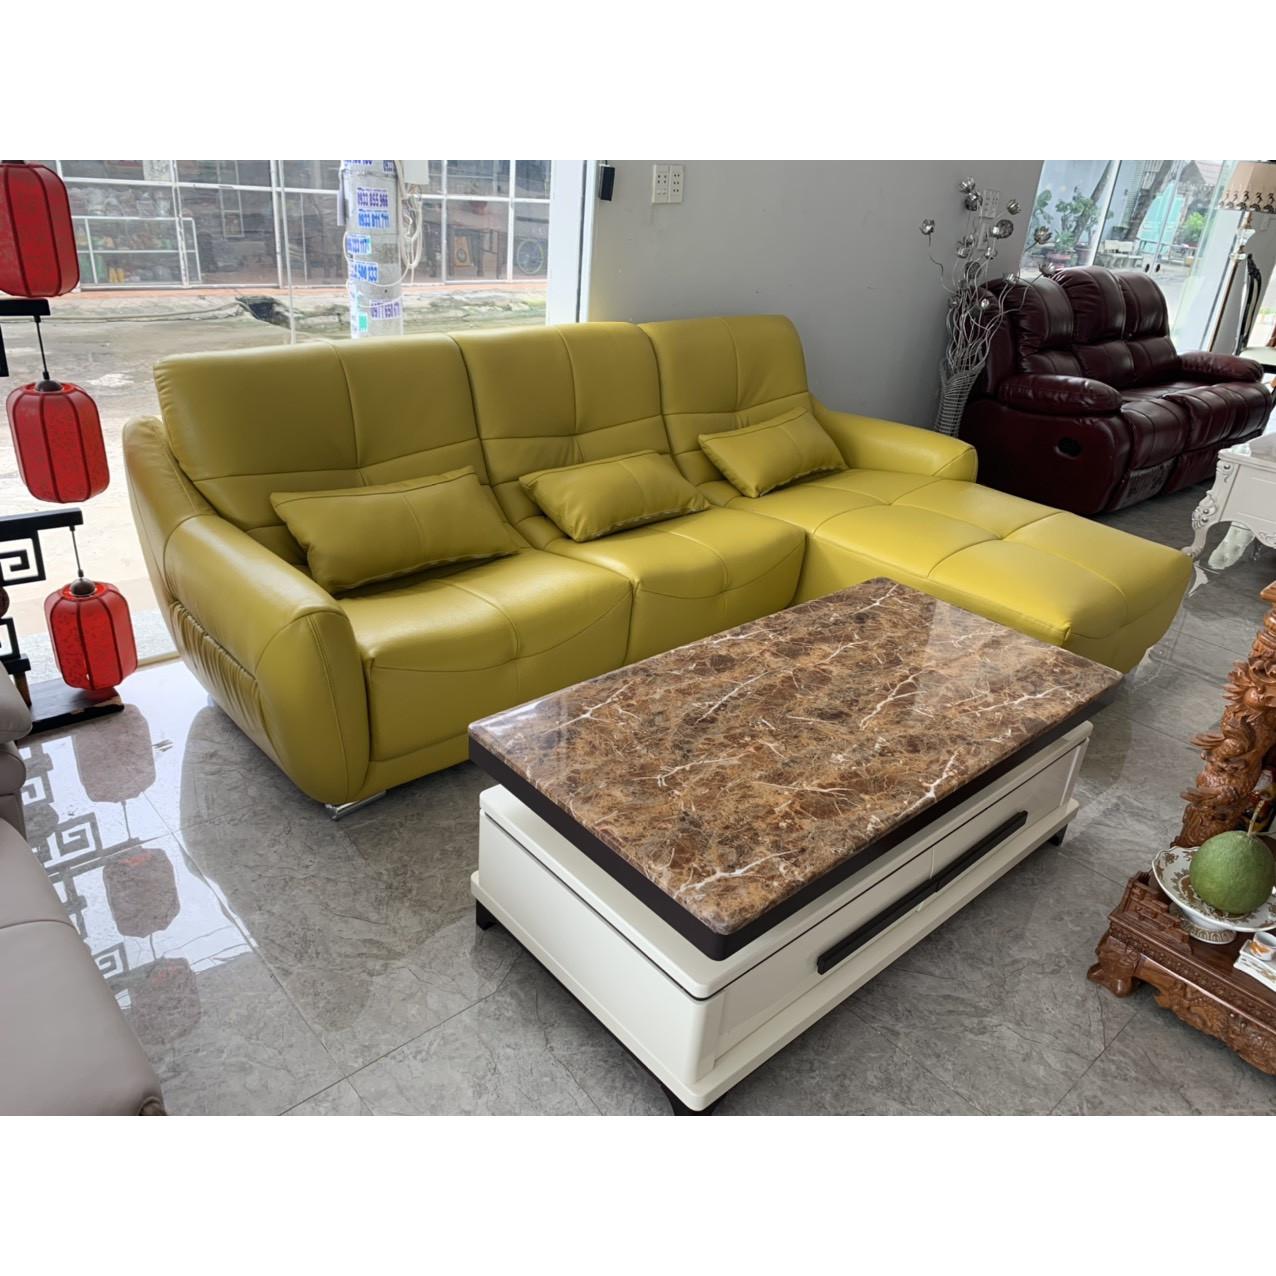 Sofa da cao cấp nhập khẩu MS6851 2M9